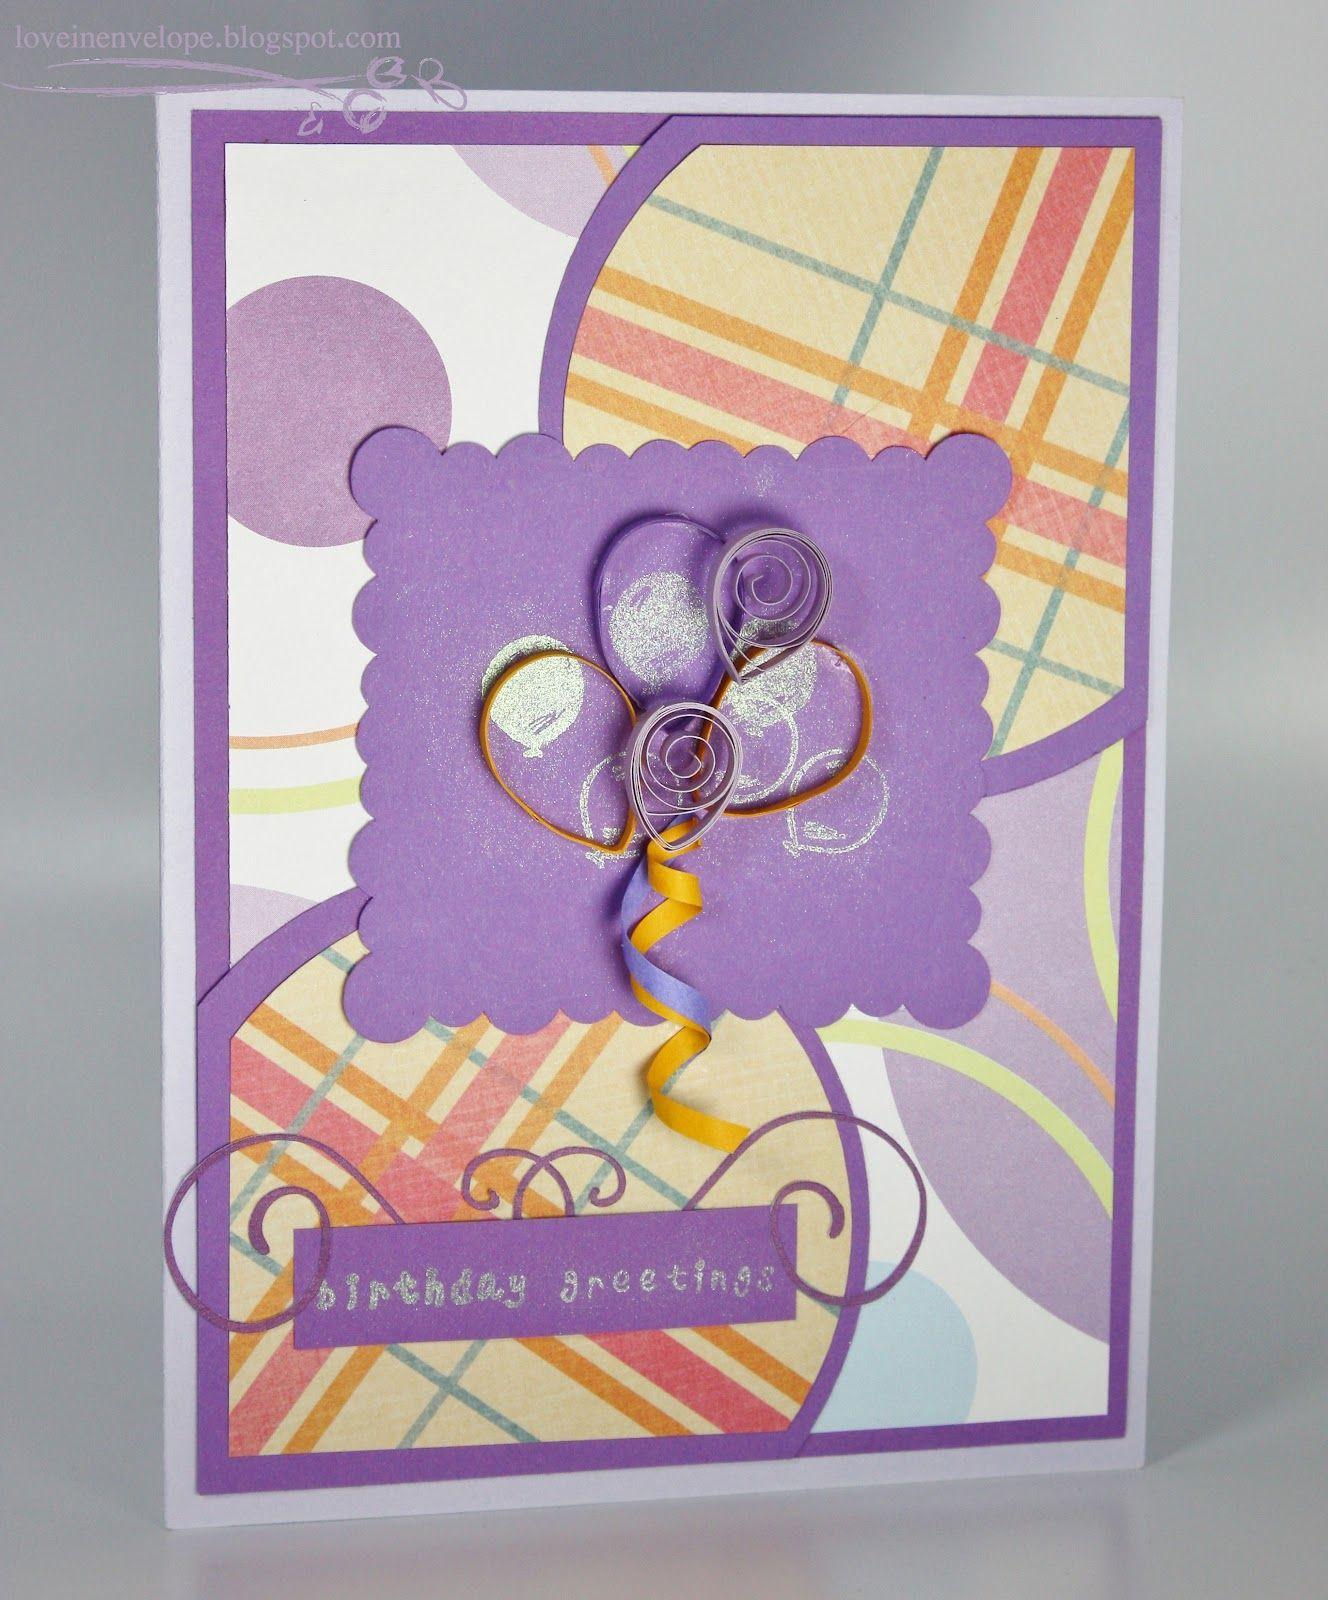 Handmade Card Design Ideas Love In Envelope Birthday Greetings